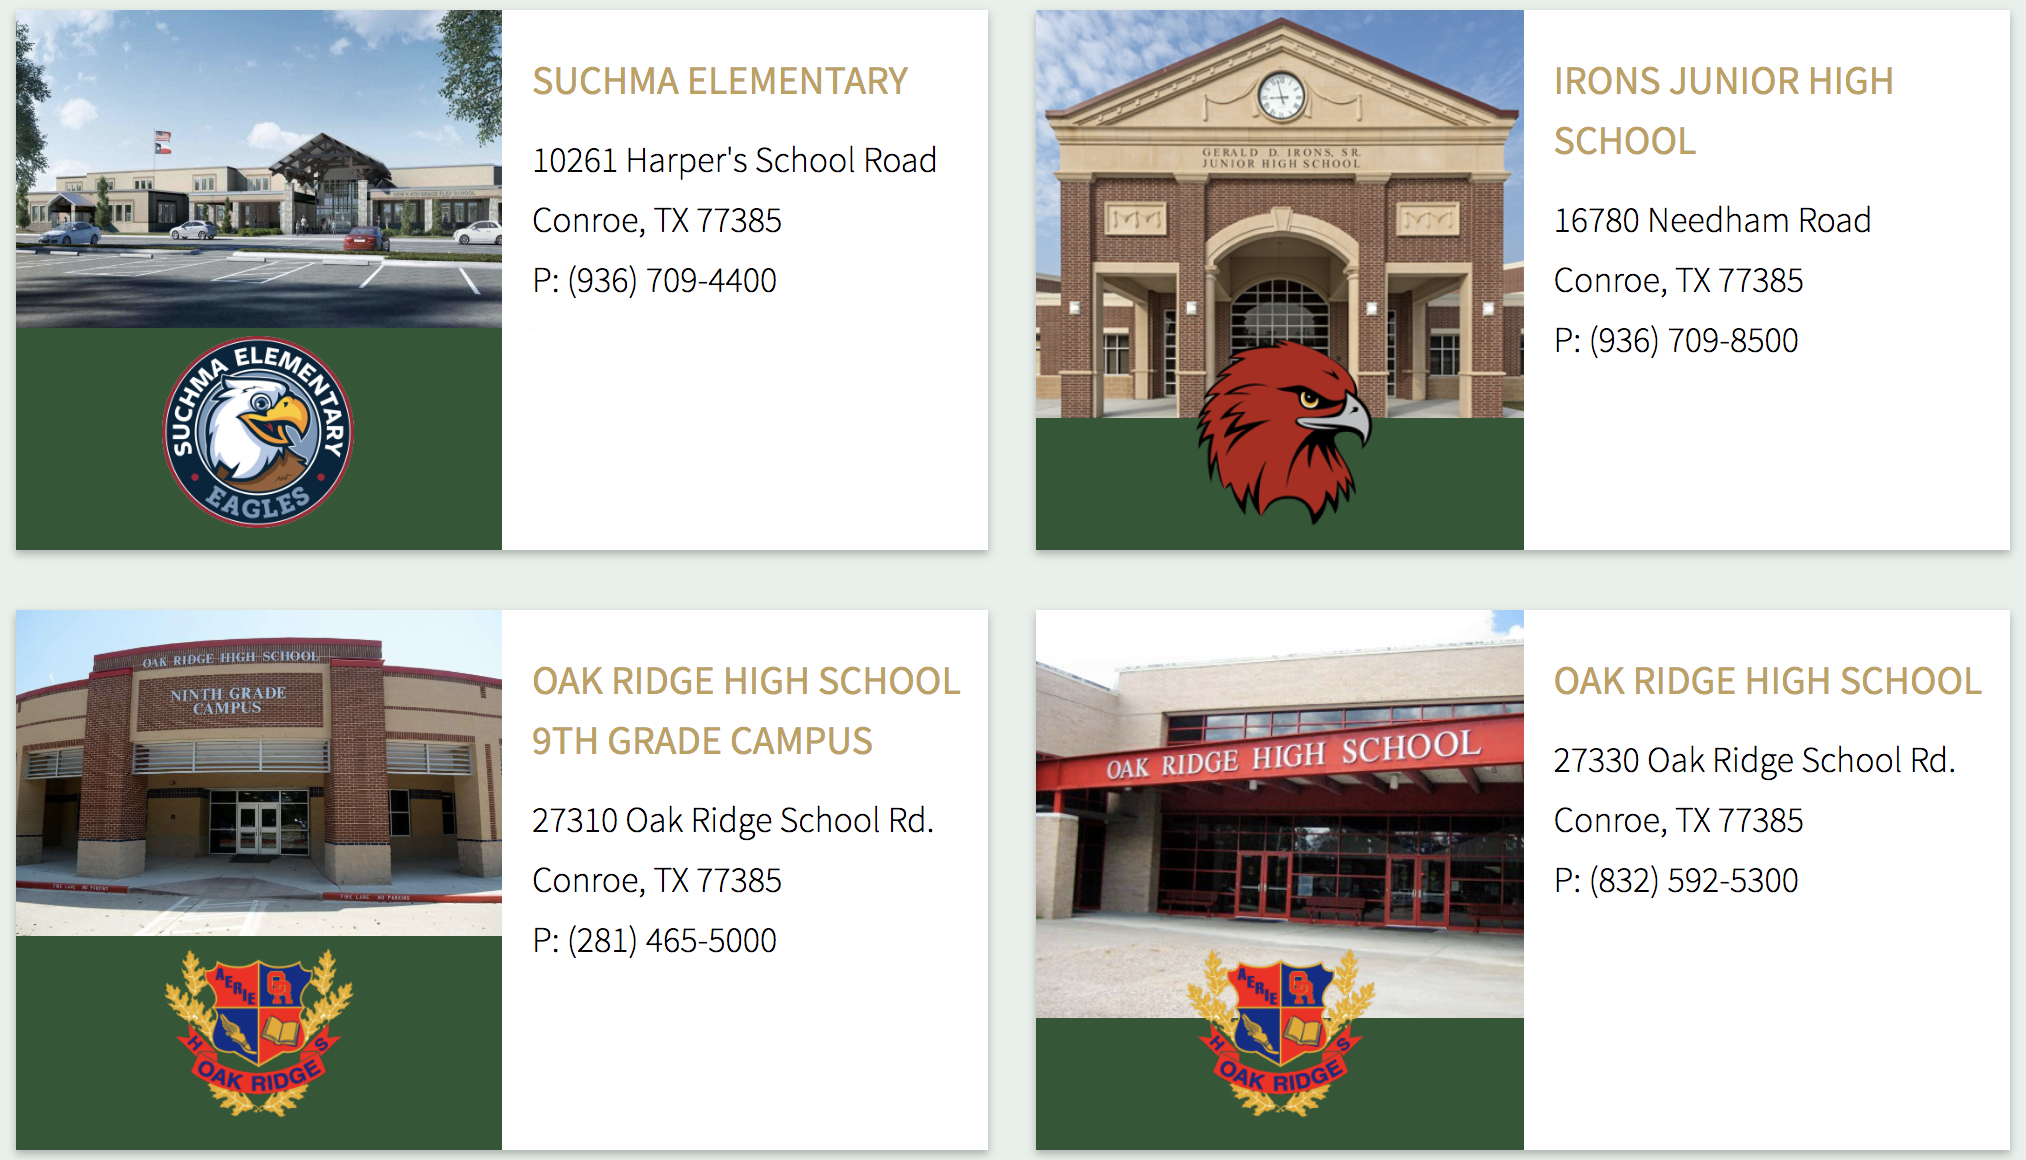 harper's preserce schools